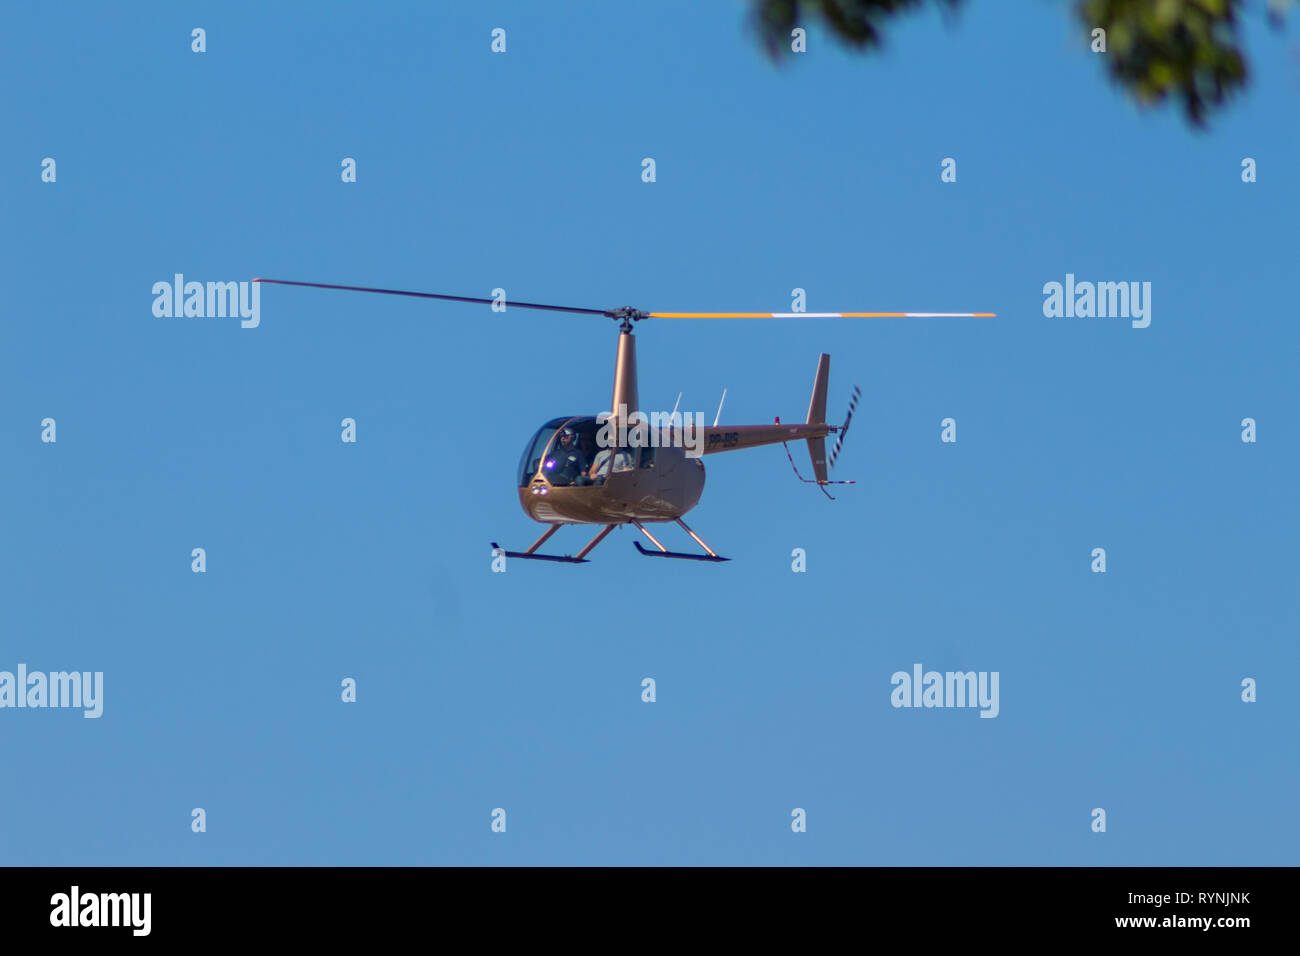 R44 flying low over Autódromo de Interlagos, in São Paulo. - Stock Image